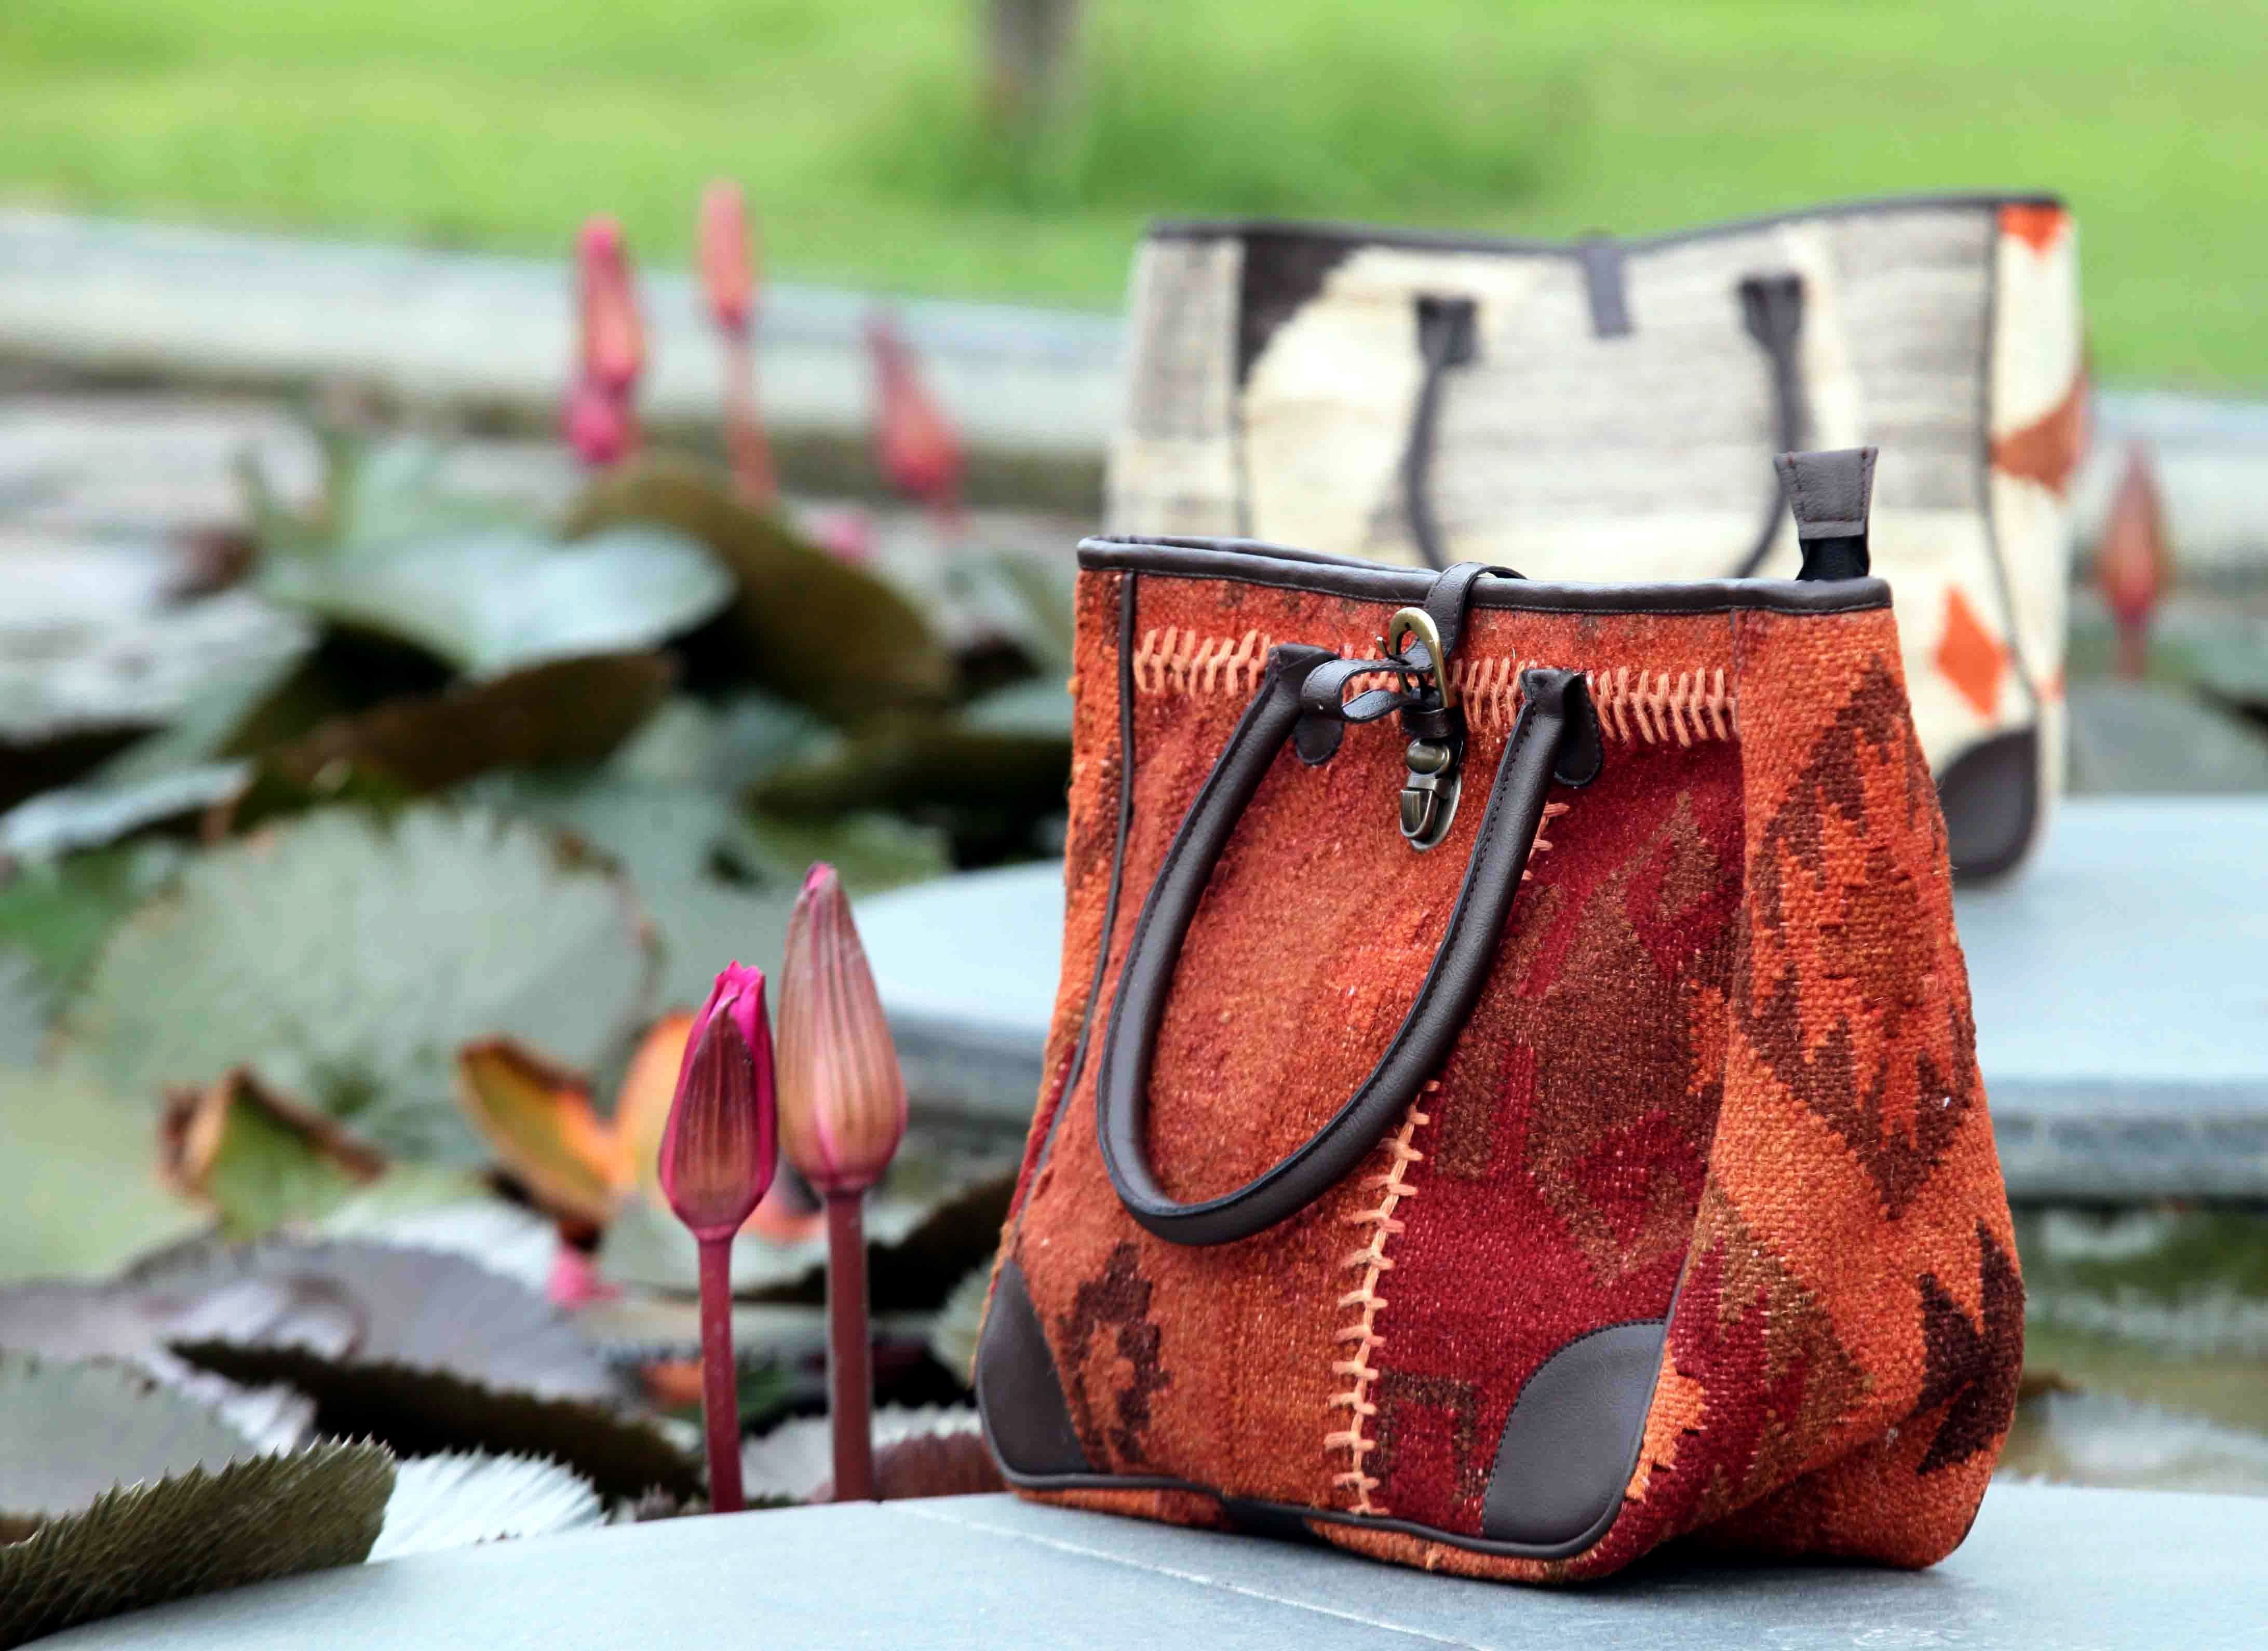 Kilim tote bag #kilim #tote #kilimbag #bohemian #bohochicstyle #boriyabasta #handcraft